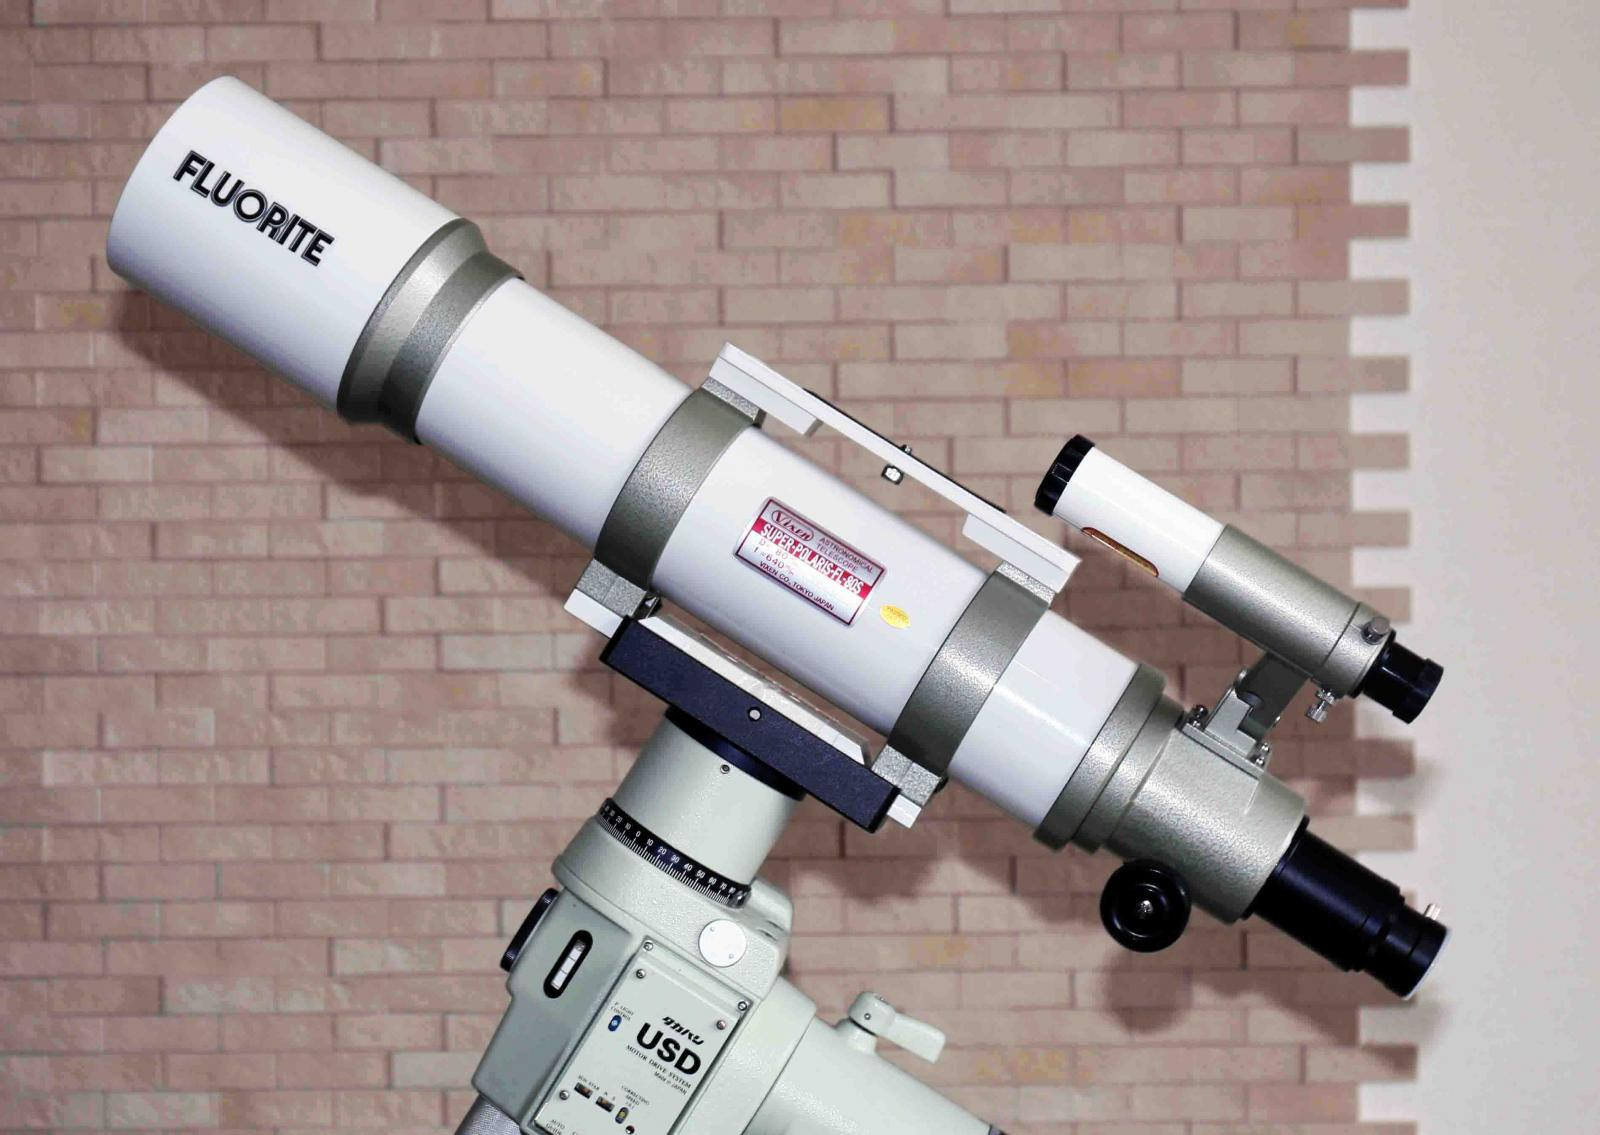 ZHBH 40mm Aperture AZ Mount,Telescope Monoculars Astronomical Refractor